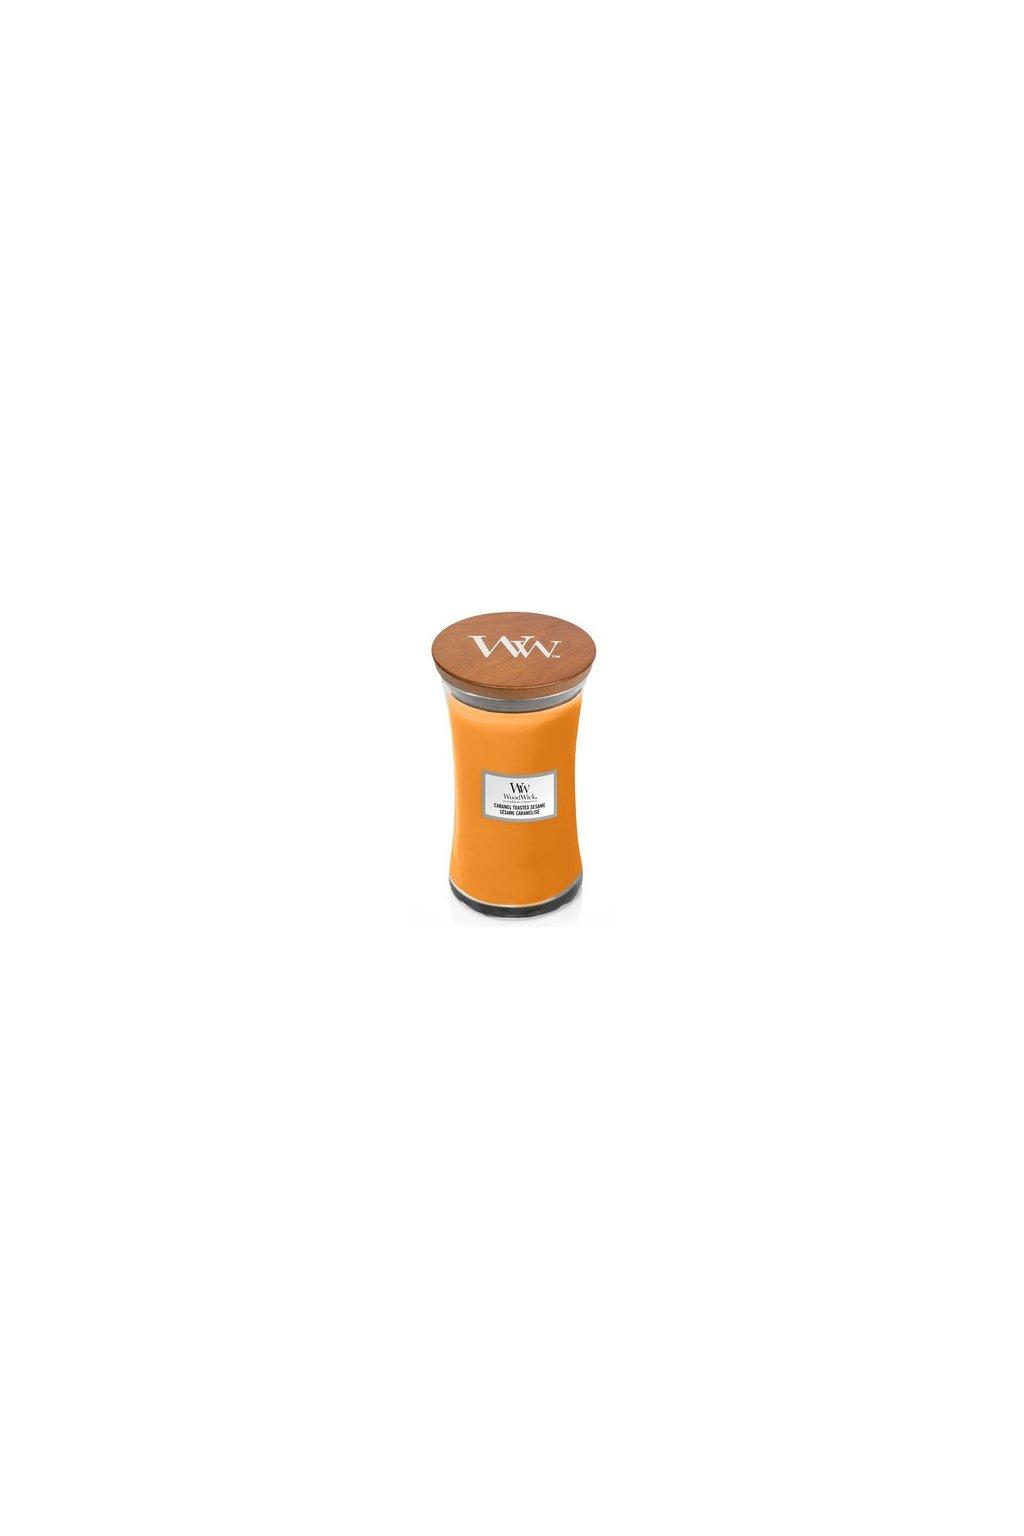 Woodwick Caramel Toasted Sesame 609g